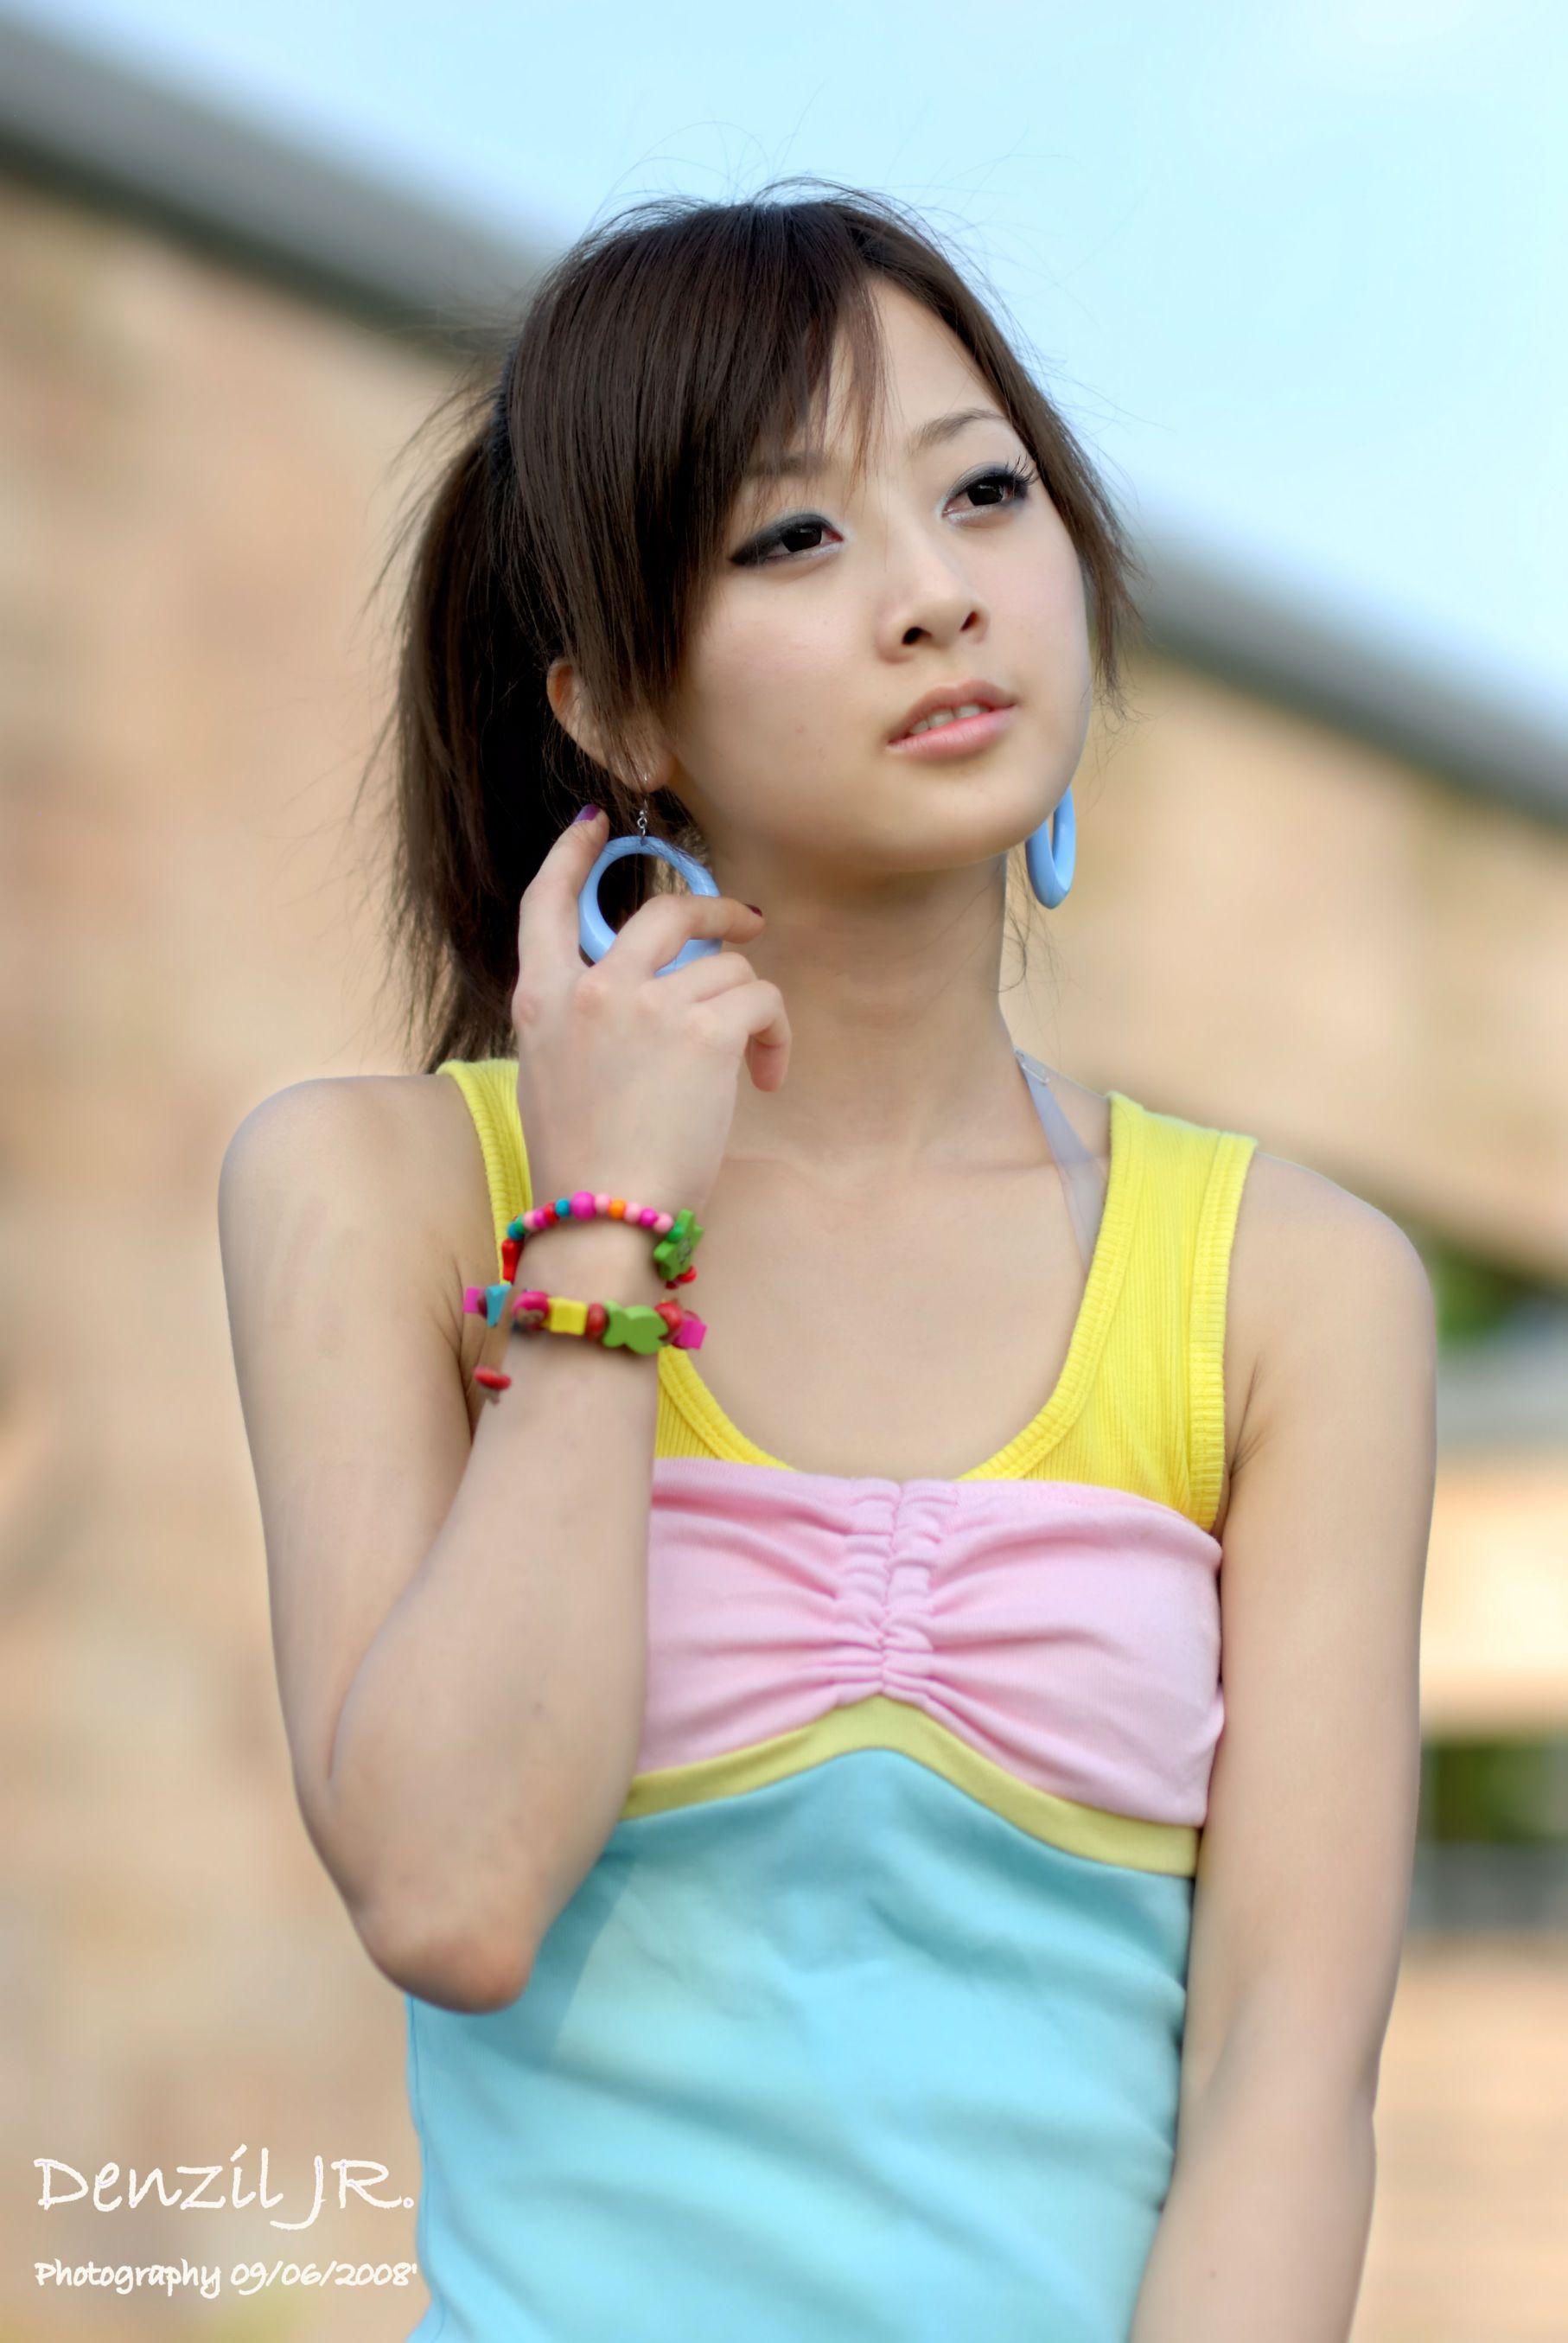 VOL.509 [台湾正妹]清新阳光连衣裙明星:张凯洁(张允霏,果子MM)高品质写真套图(45P)